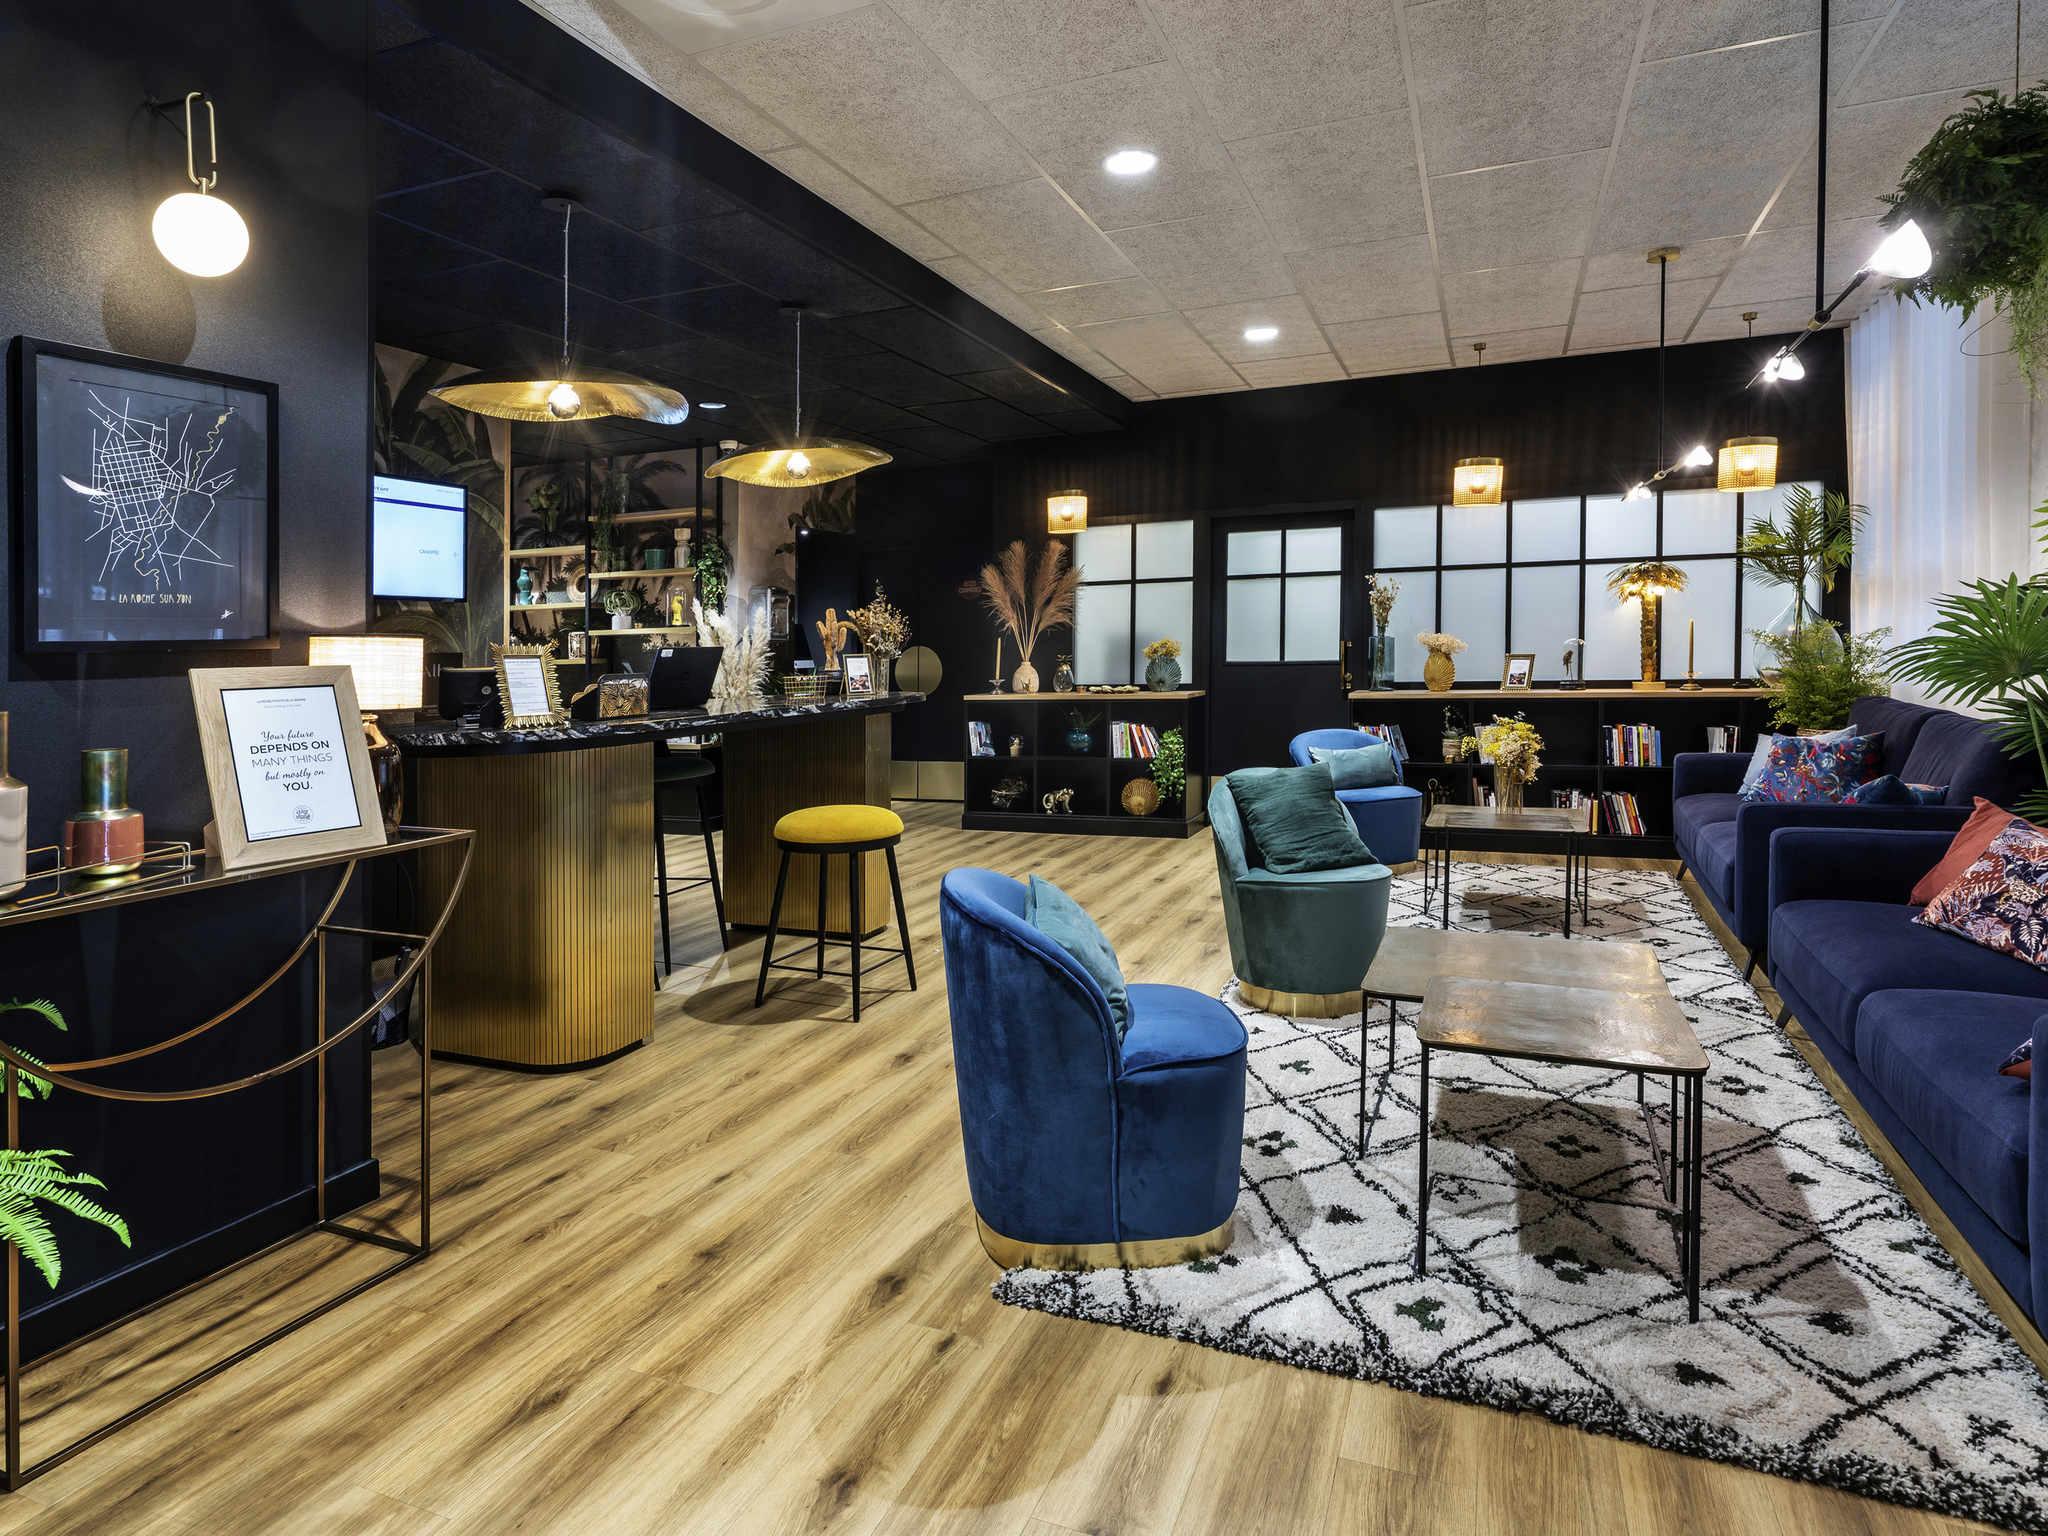 فندق - Hôtel Mercure La Roche-sur-Yon Centre